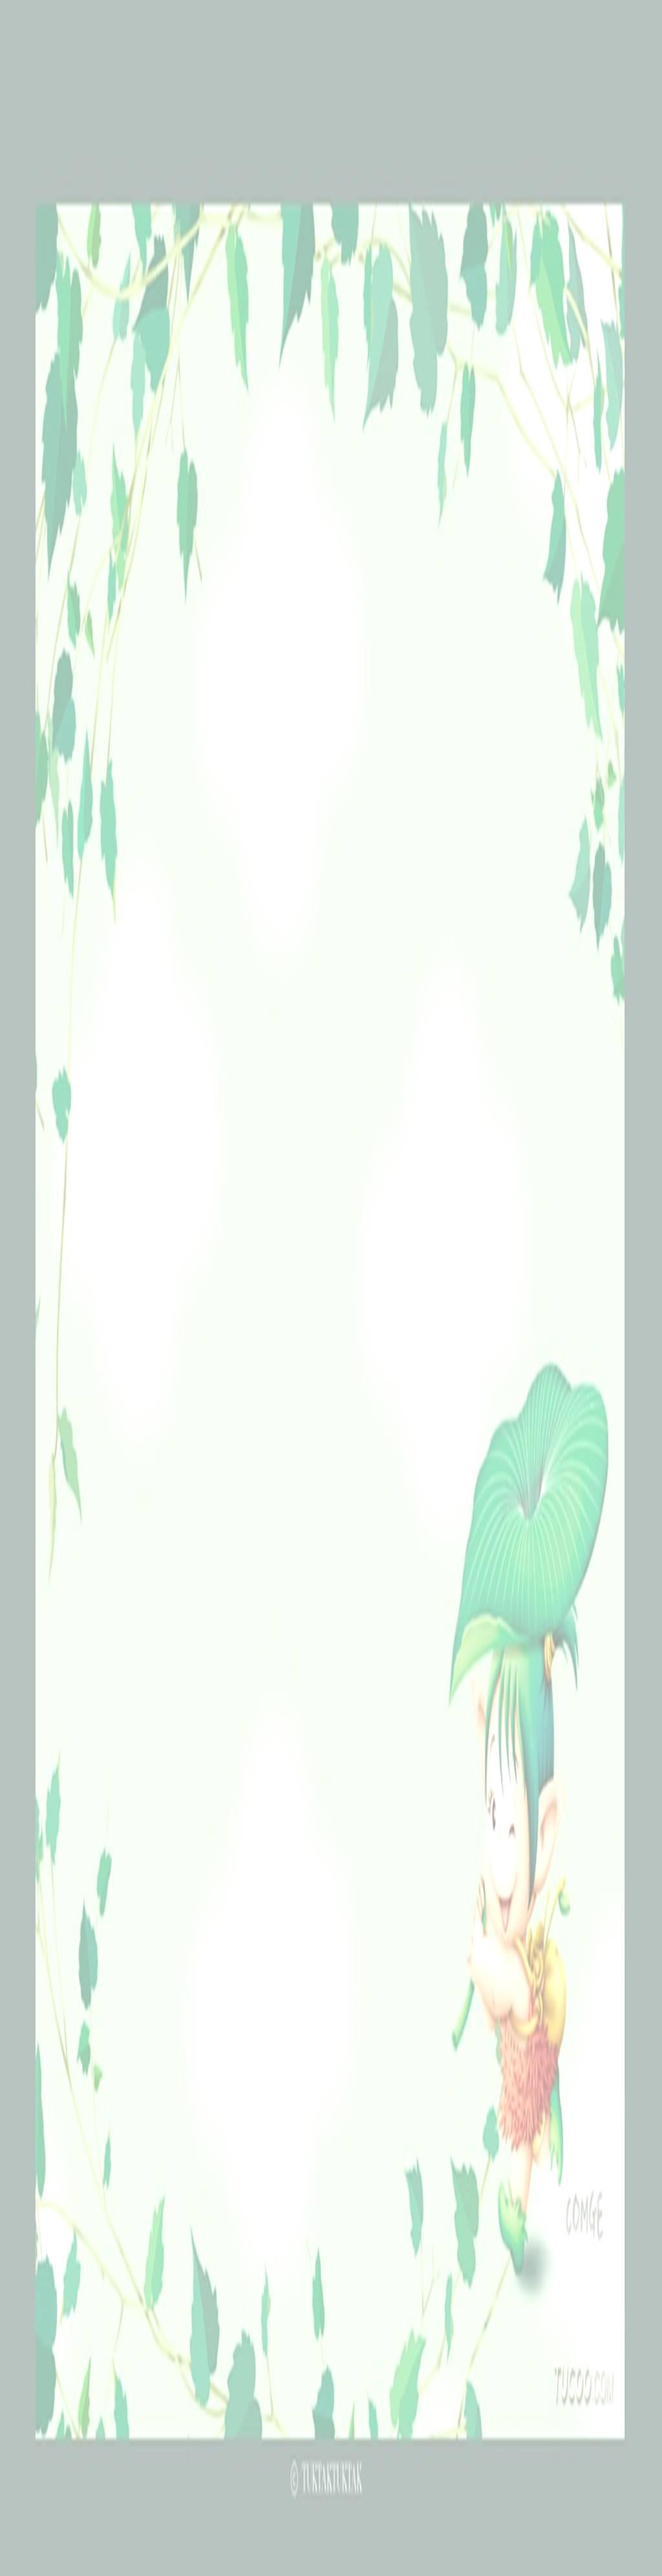 ppt 背景 背景图片 边框 模板 设计 相框 1024_3984 竖版 竖屏